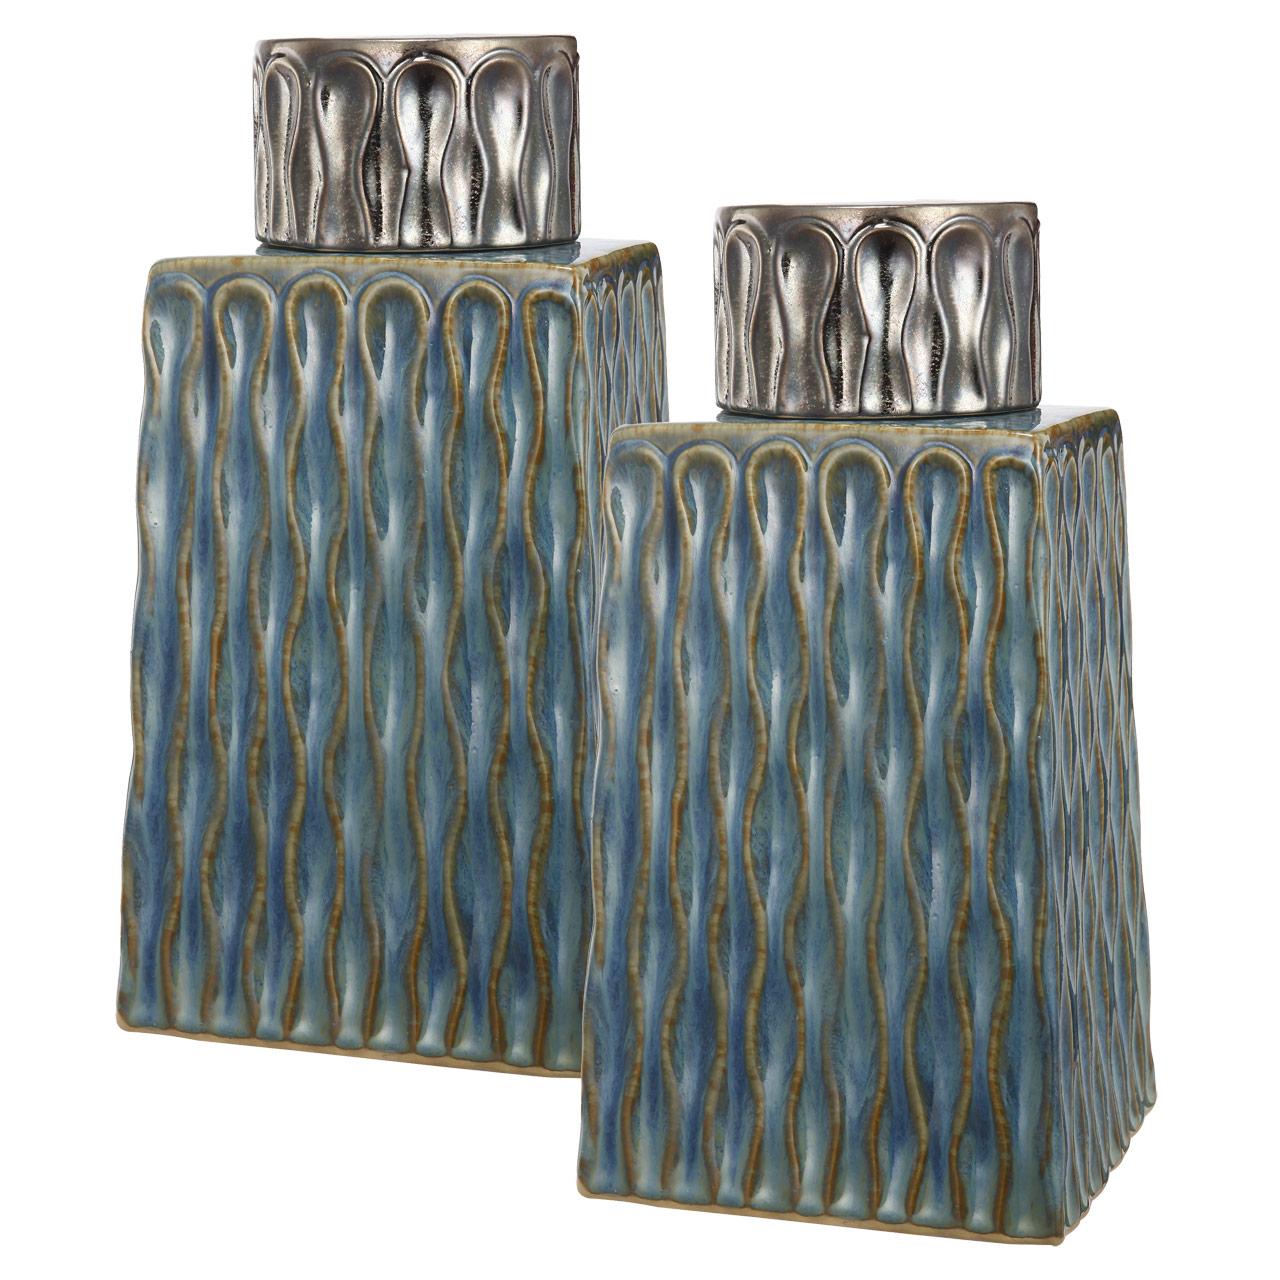 {} ARTEVALUCE Ваза с крышкой Xylia (14х16х31 см - 2 шт) artevaluce ваза с крышкой orlenda цвет зеленый 11х17х51 см